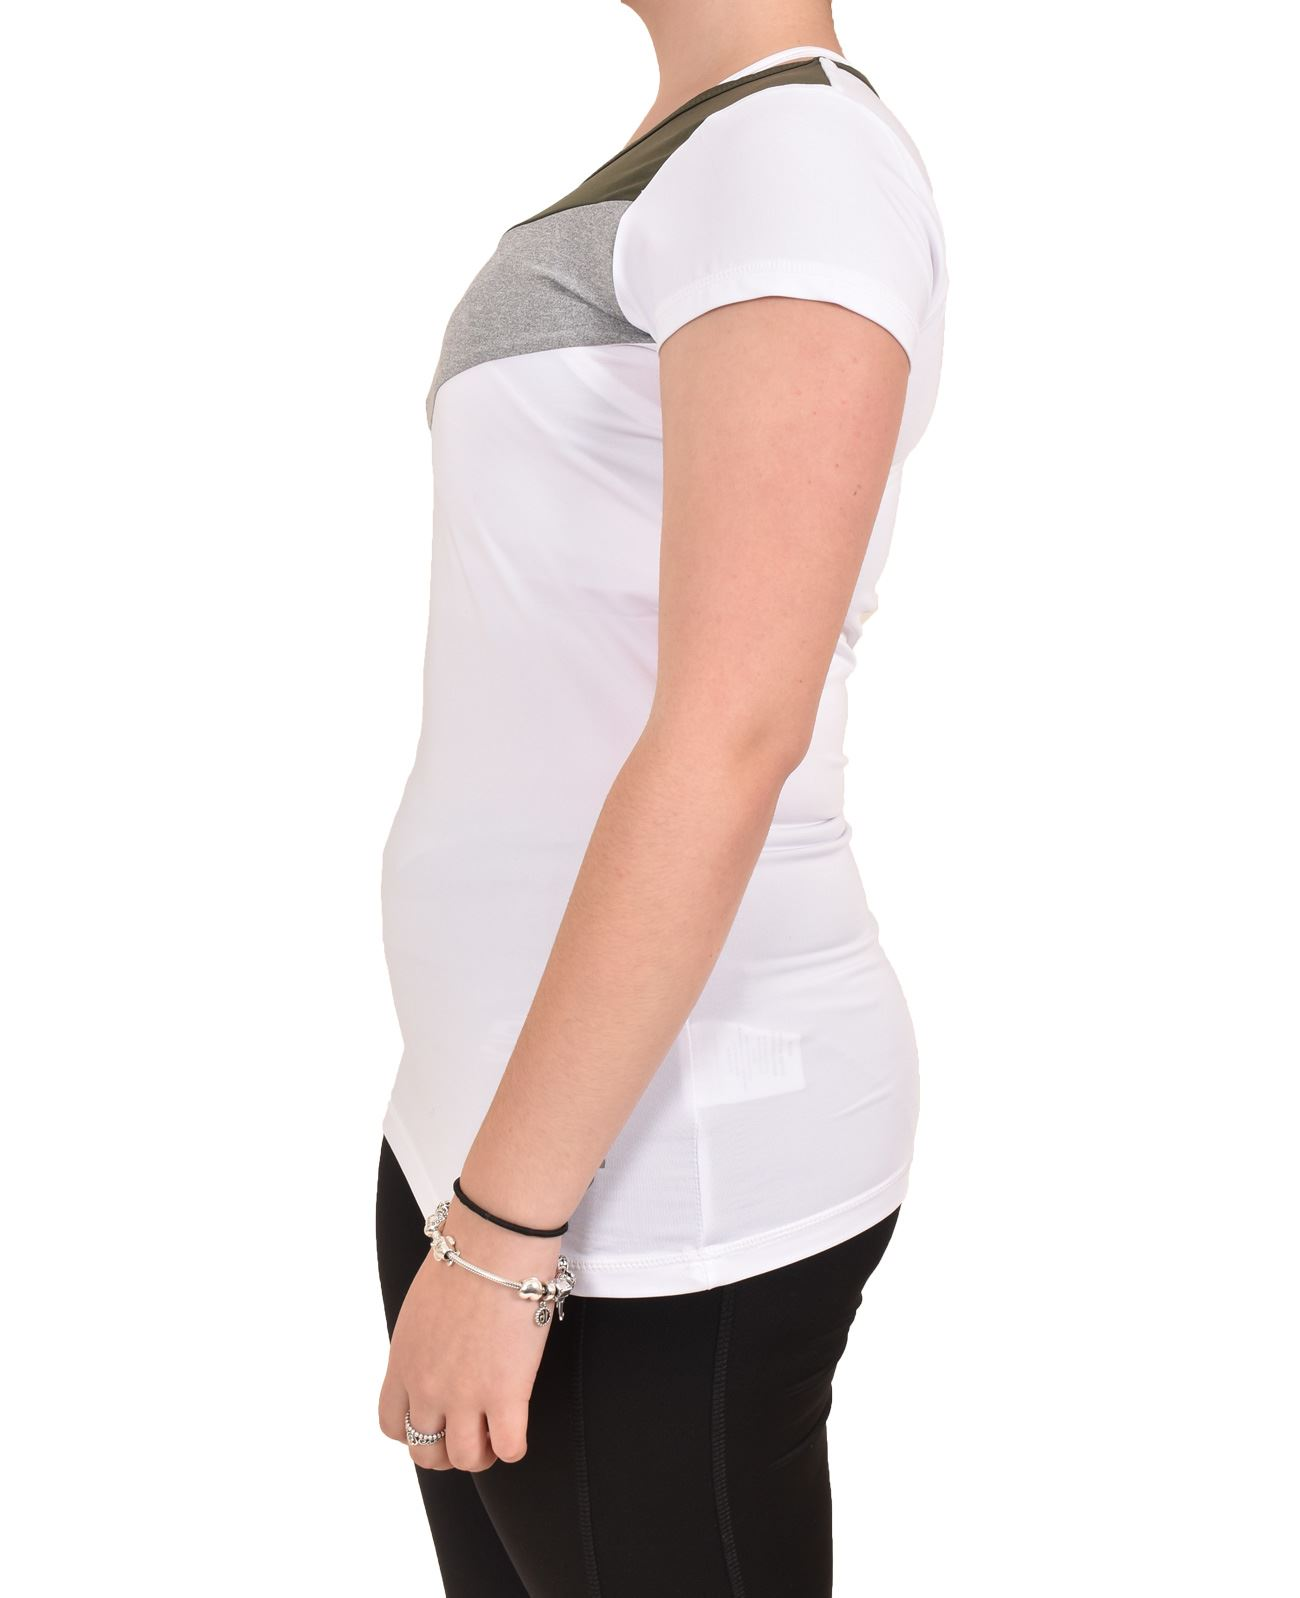 Camiseta-para-mujer-Skechers-Secado-Rapido-Top-senoras-de-Deportes-Activewear-Gimnasio-Fitness-Dance miniatura 15